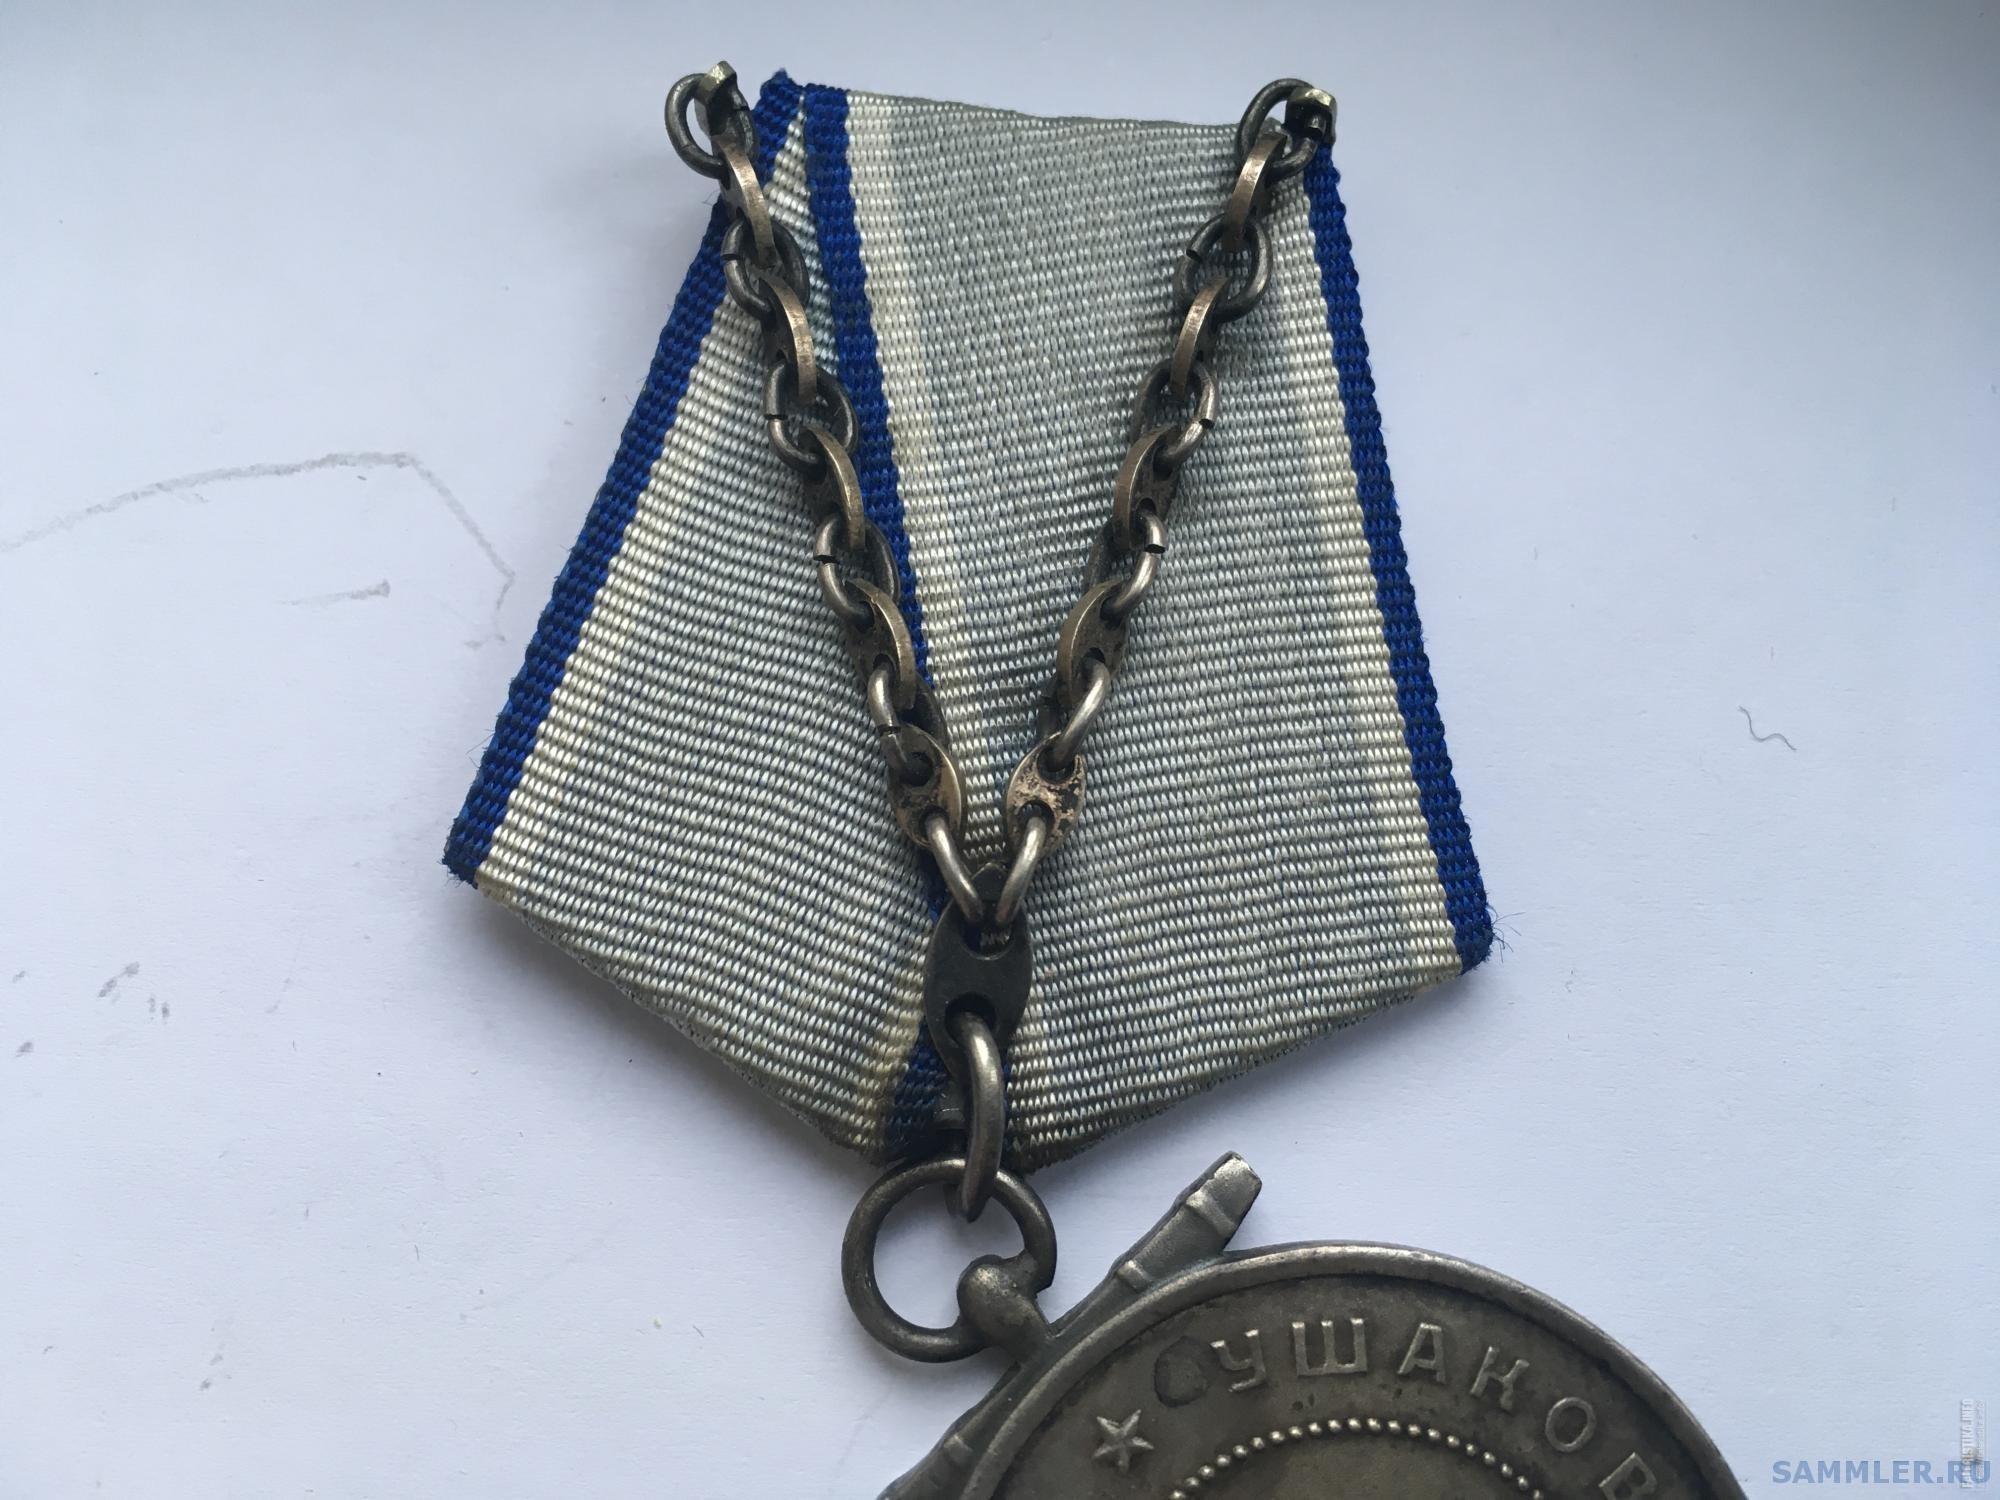 Медаль Ушакова с Документом для Юнг_5.jpg